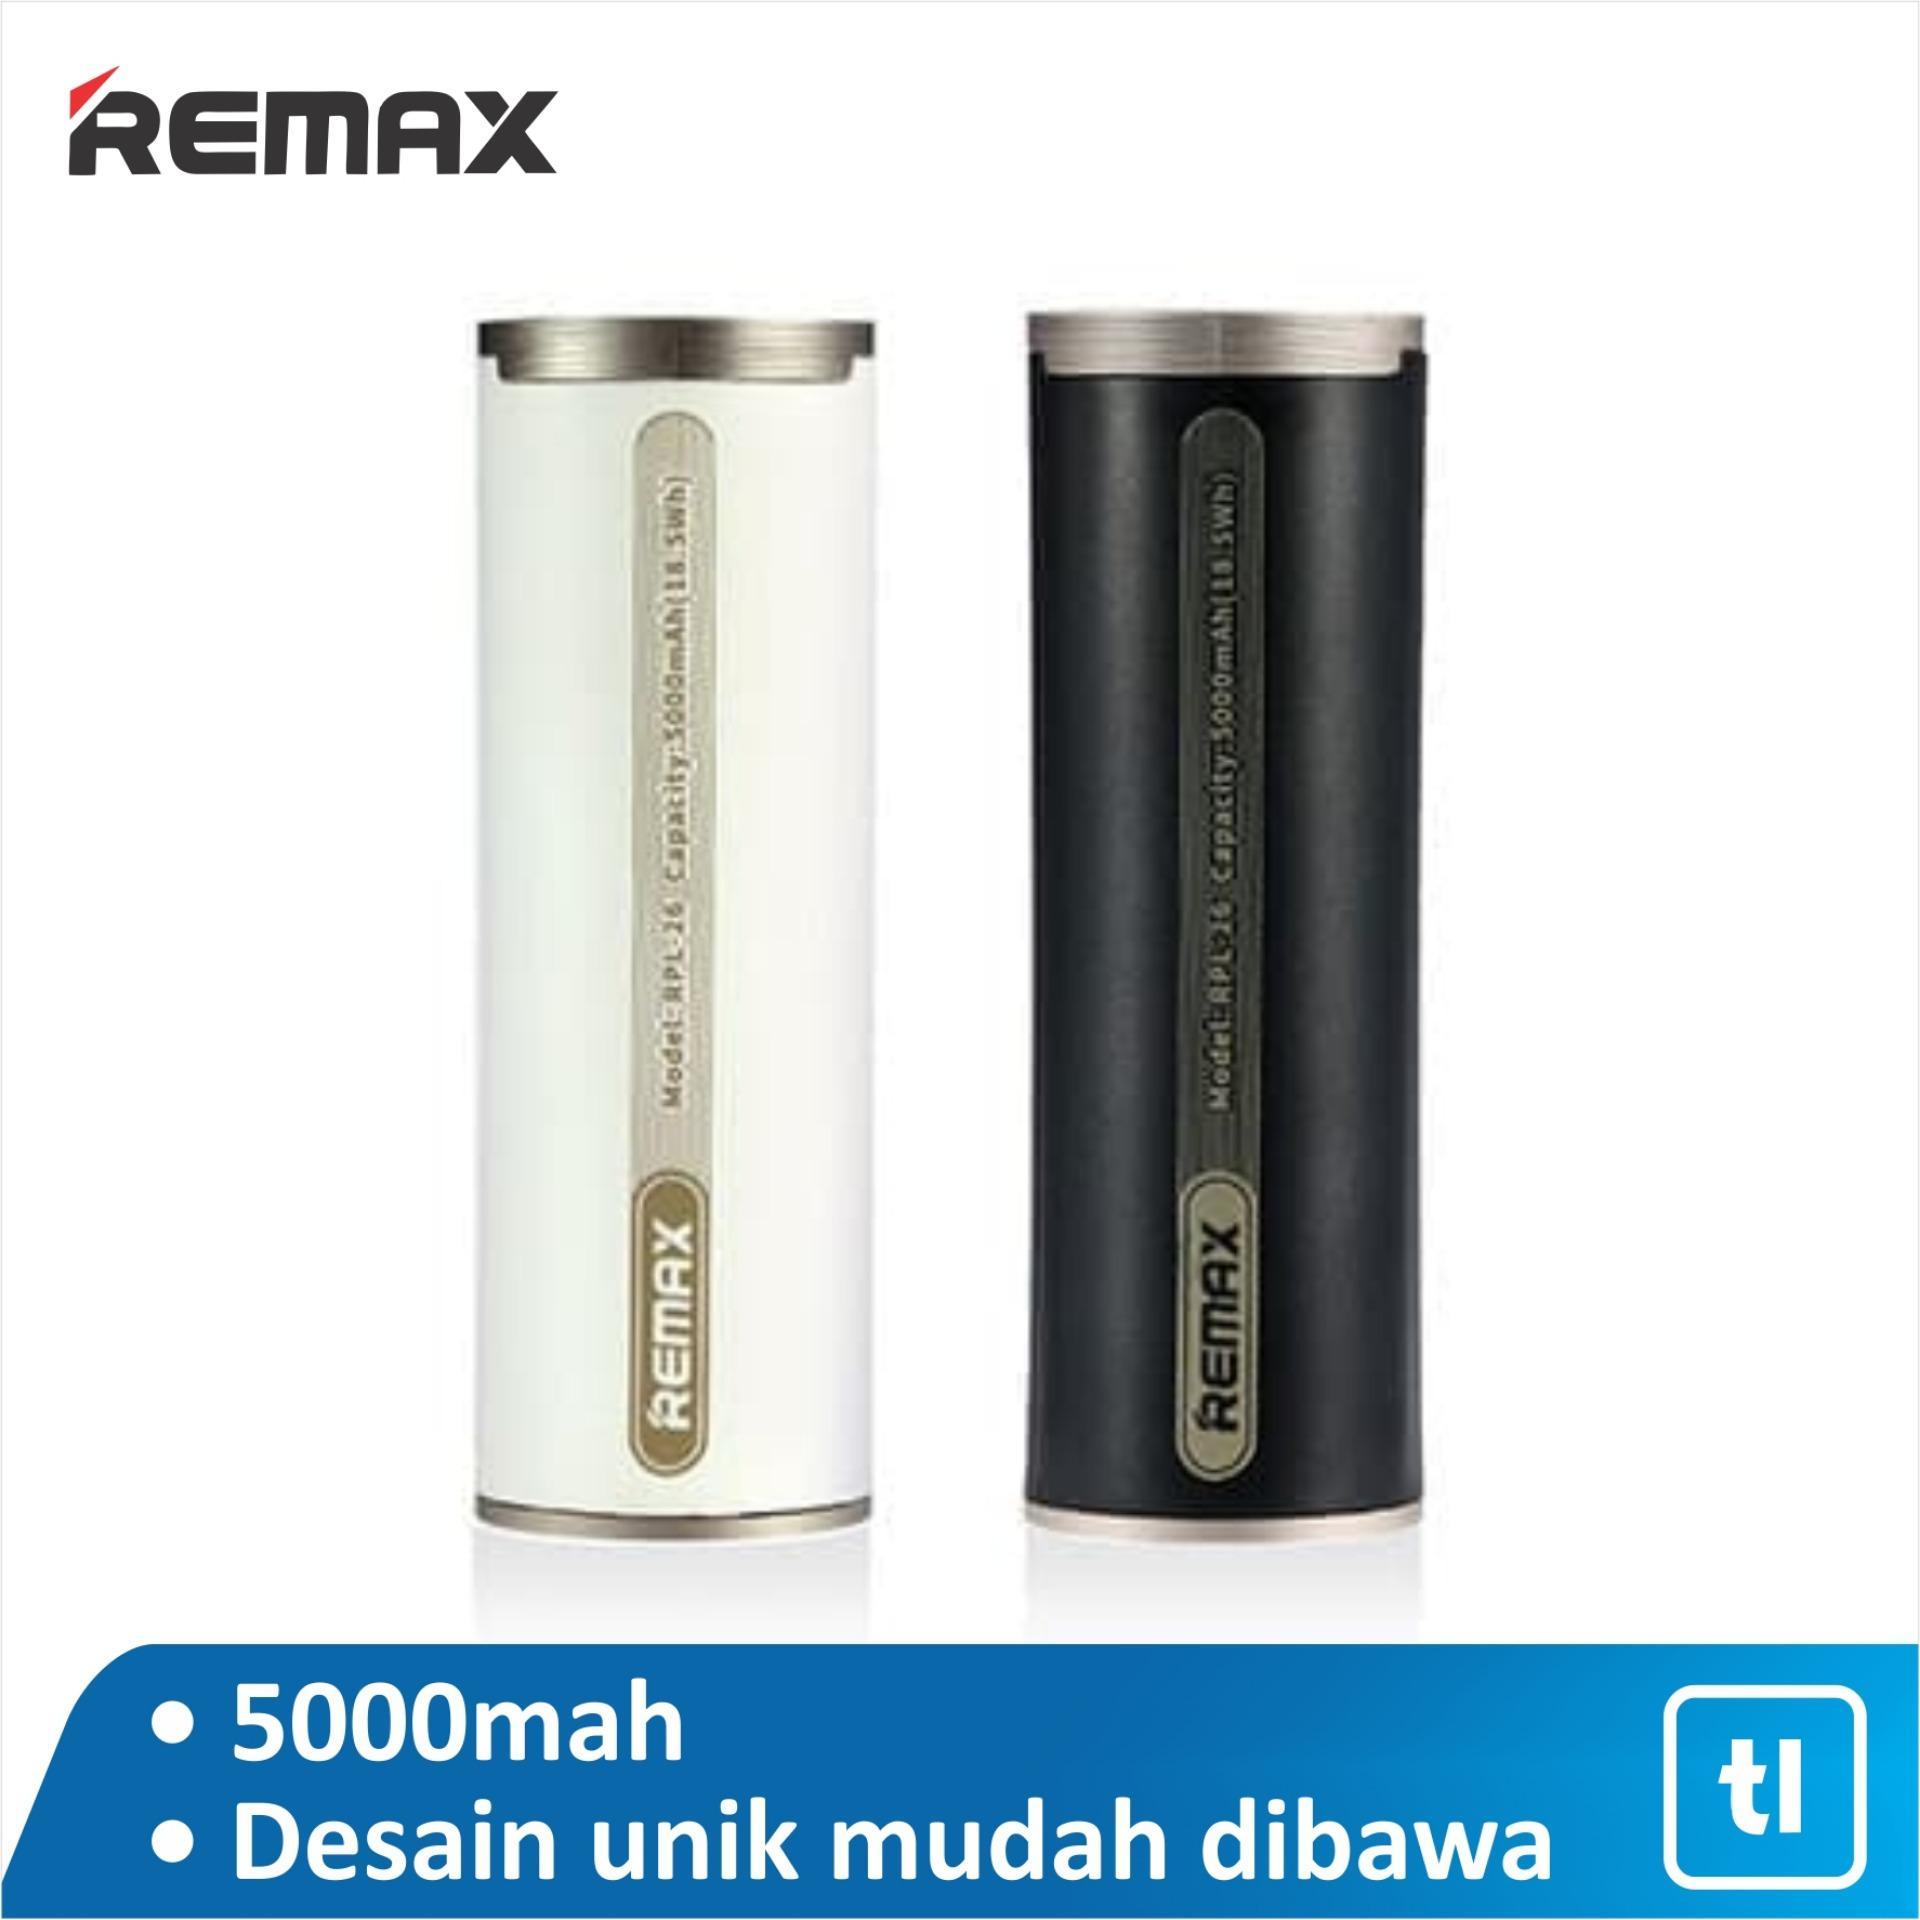 Remax Power bank Ring Holder 5000mAh